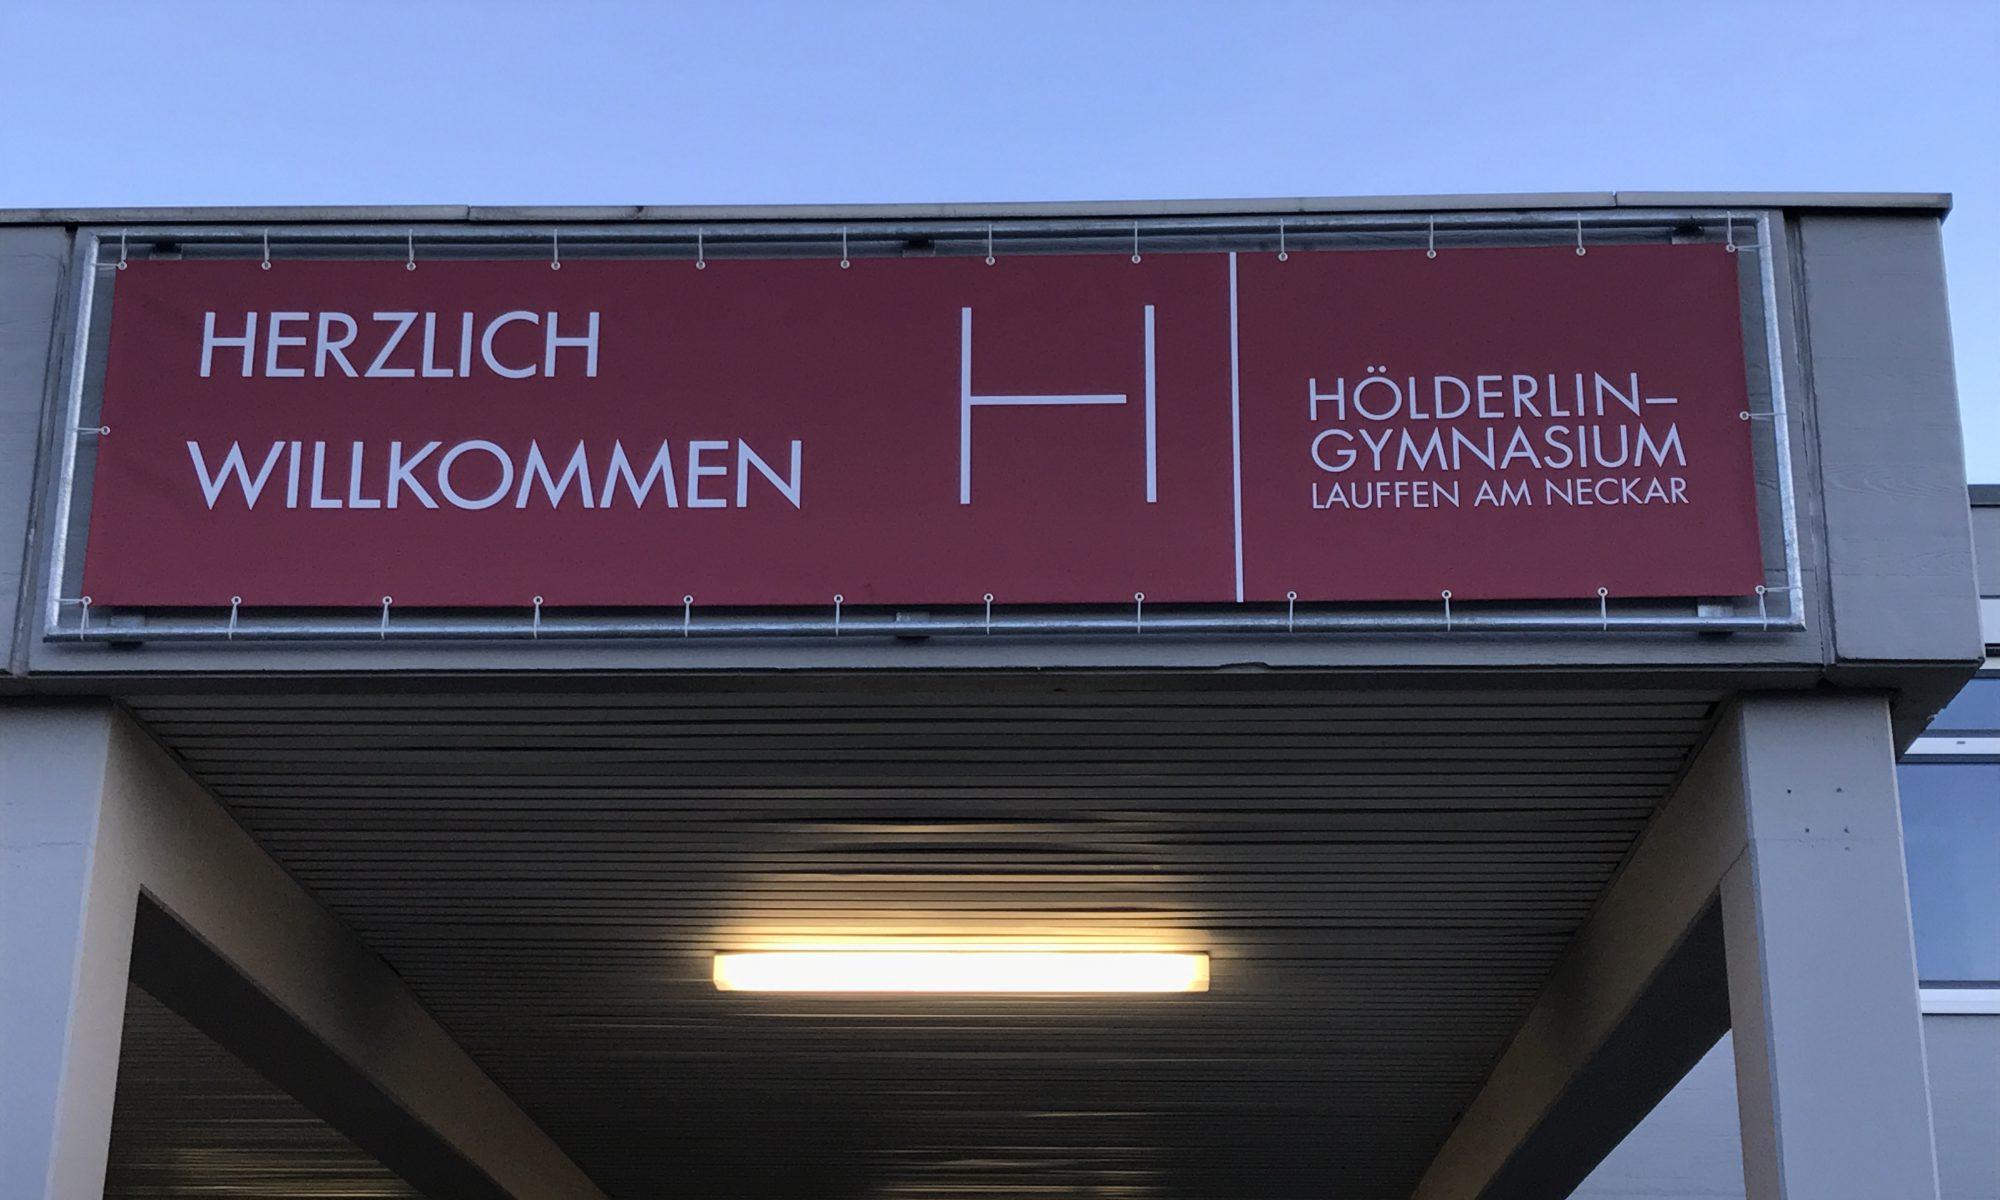 Förderverein Hölderlin-Gymnasium Lauffen